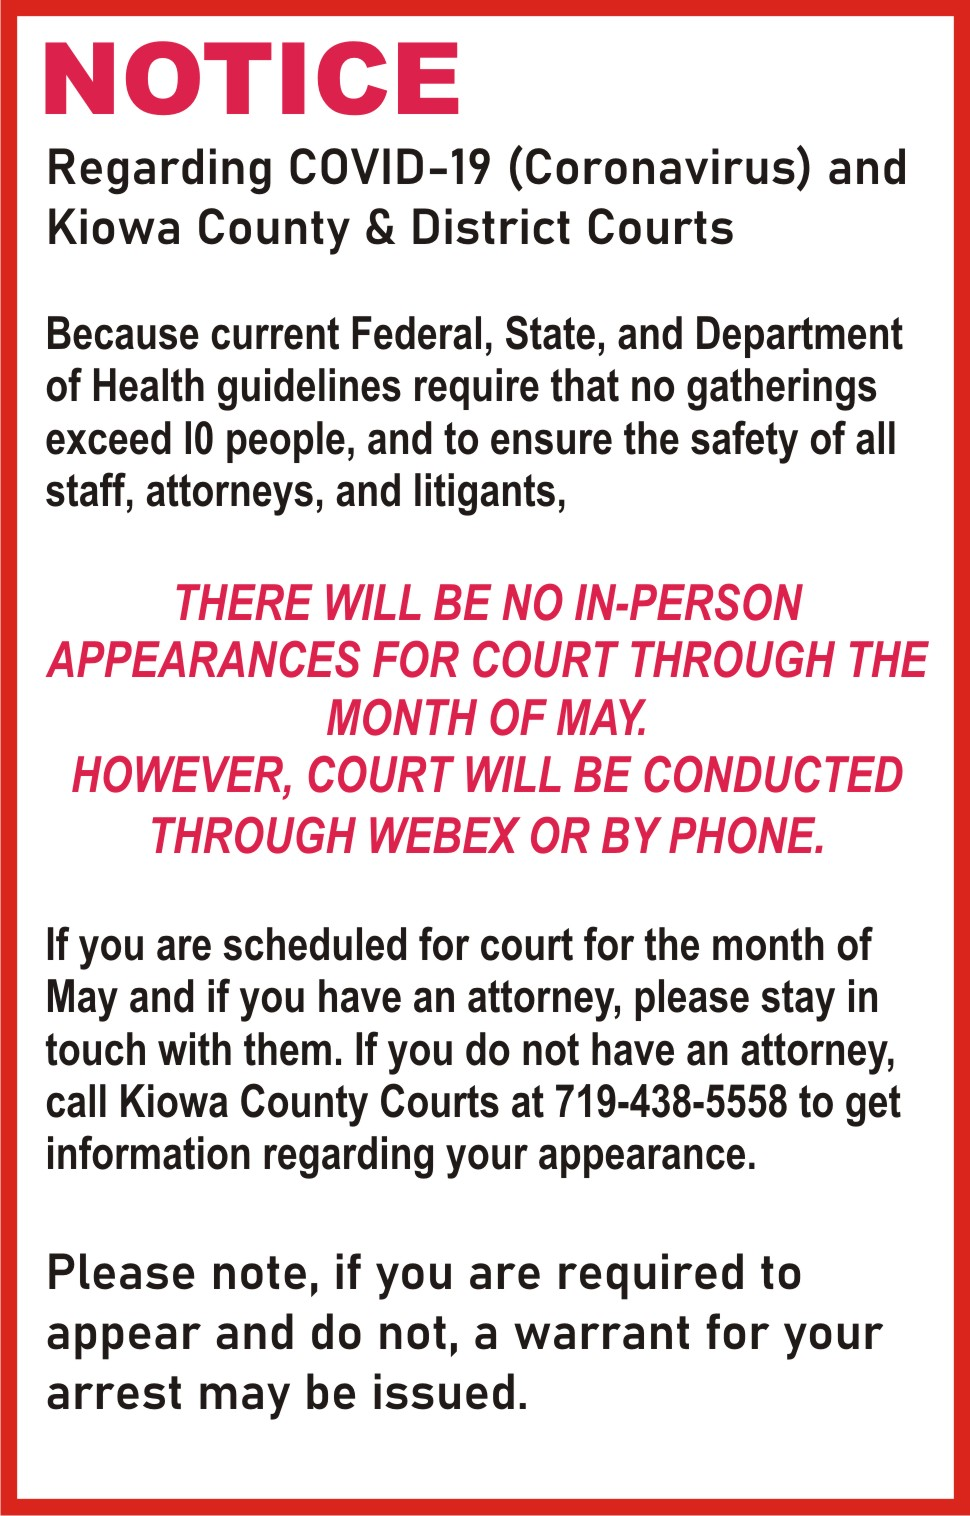 AD 2020-05 Kiowa County Court Appearances